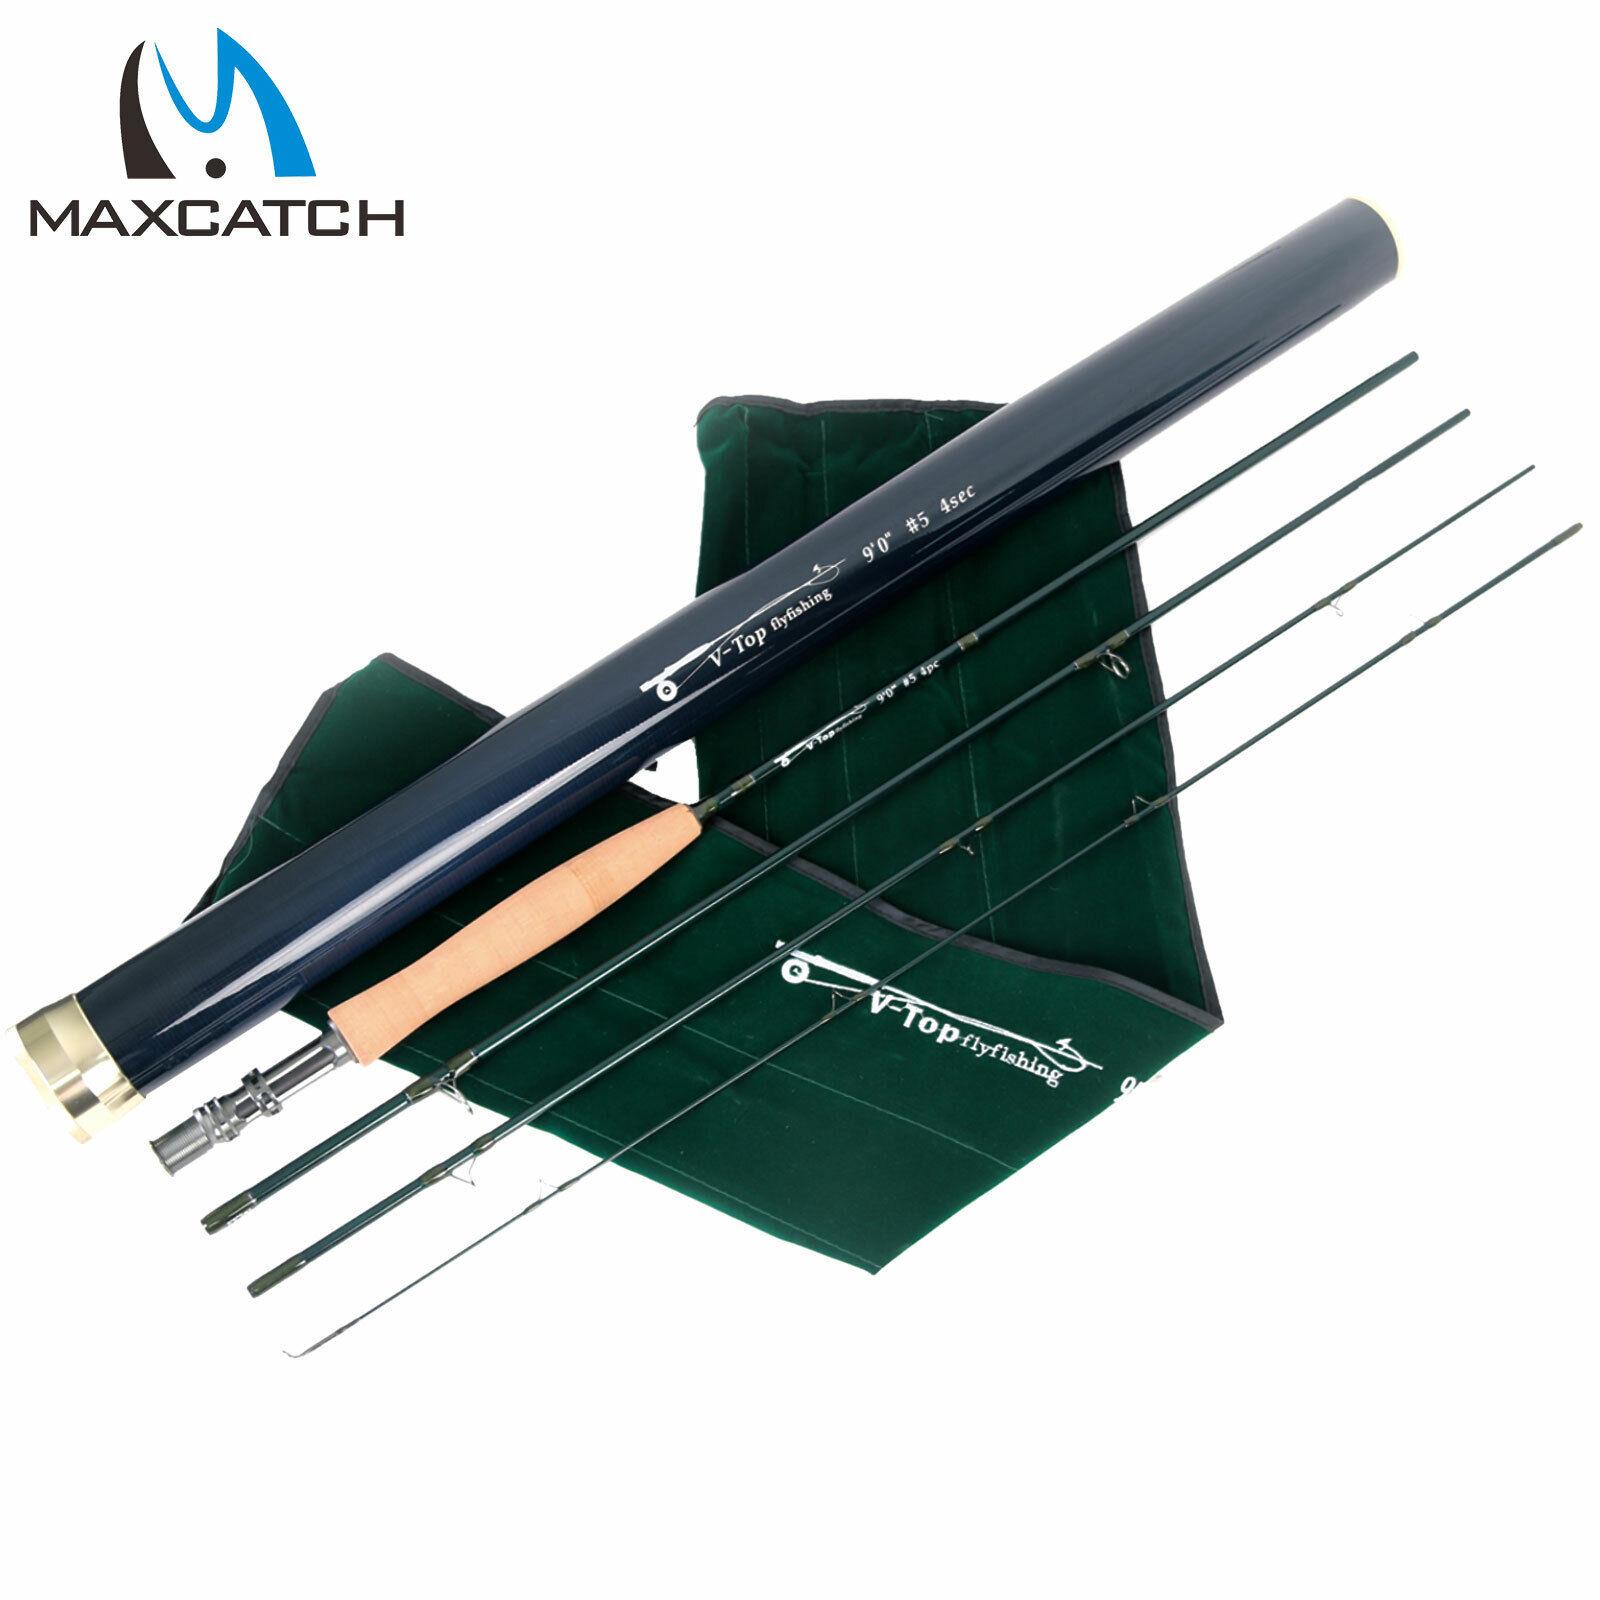 Maxcatch Top Fly Rod 5 6 8WT 9FT IM12 Grafito mejor acción rápida Varilla de pesca con mosca